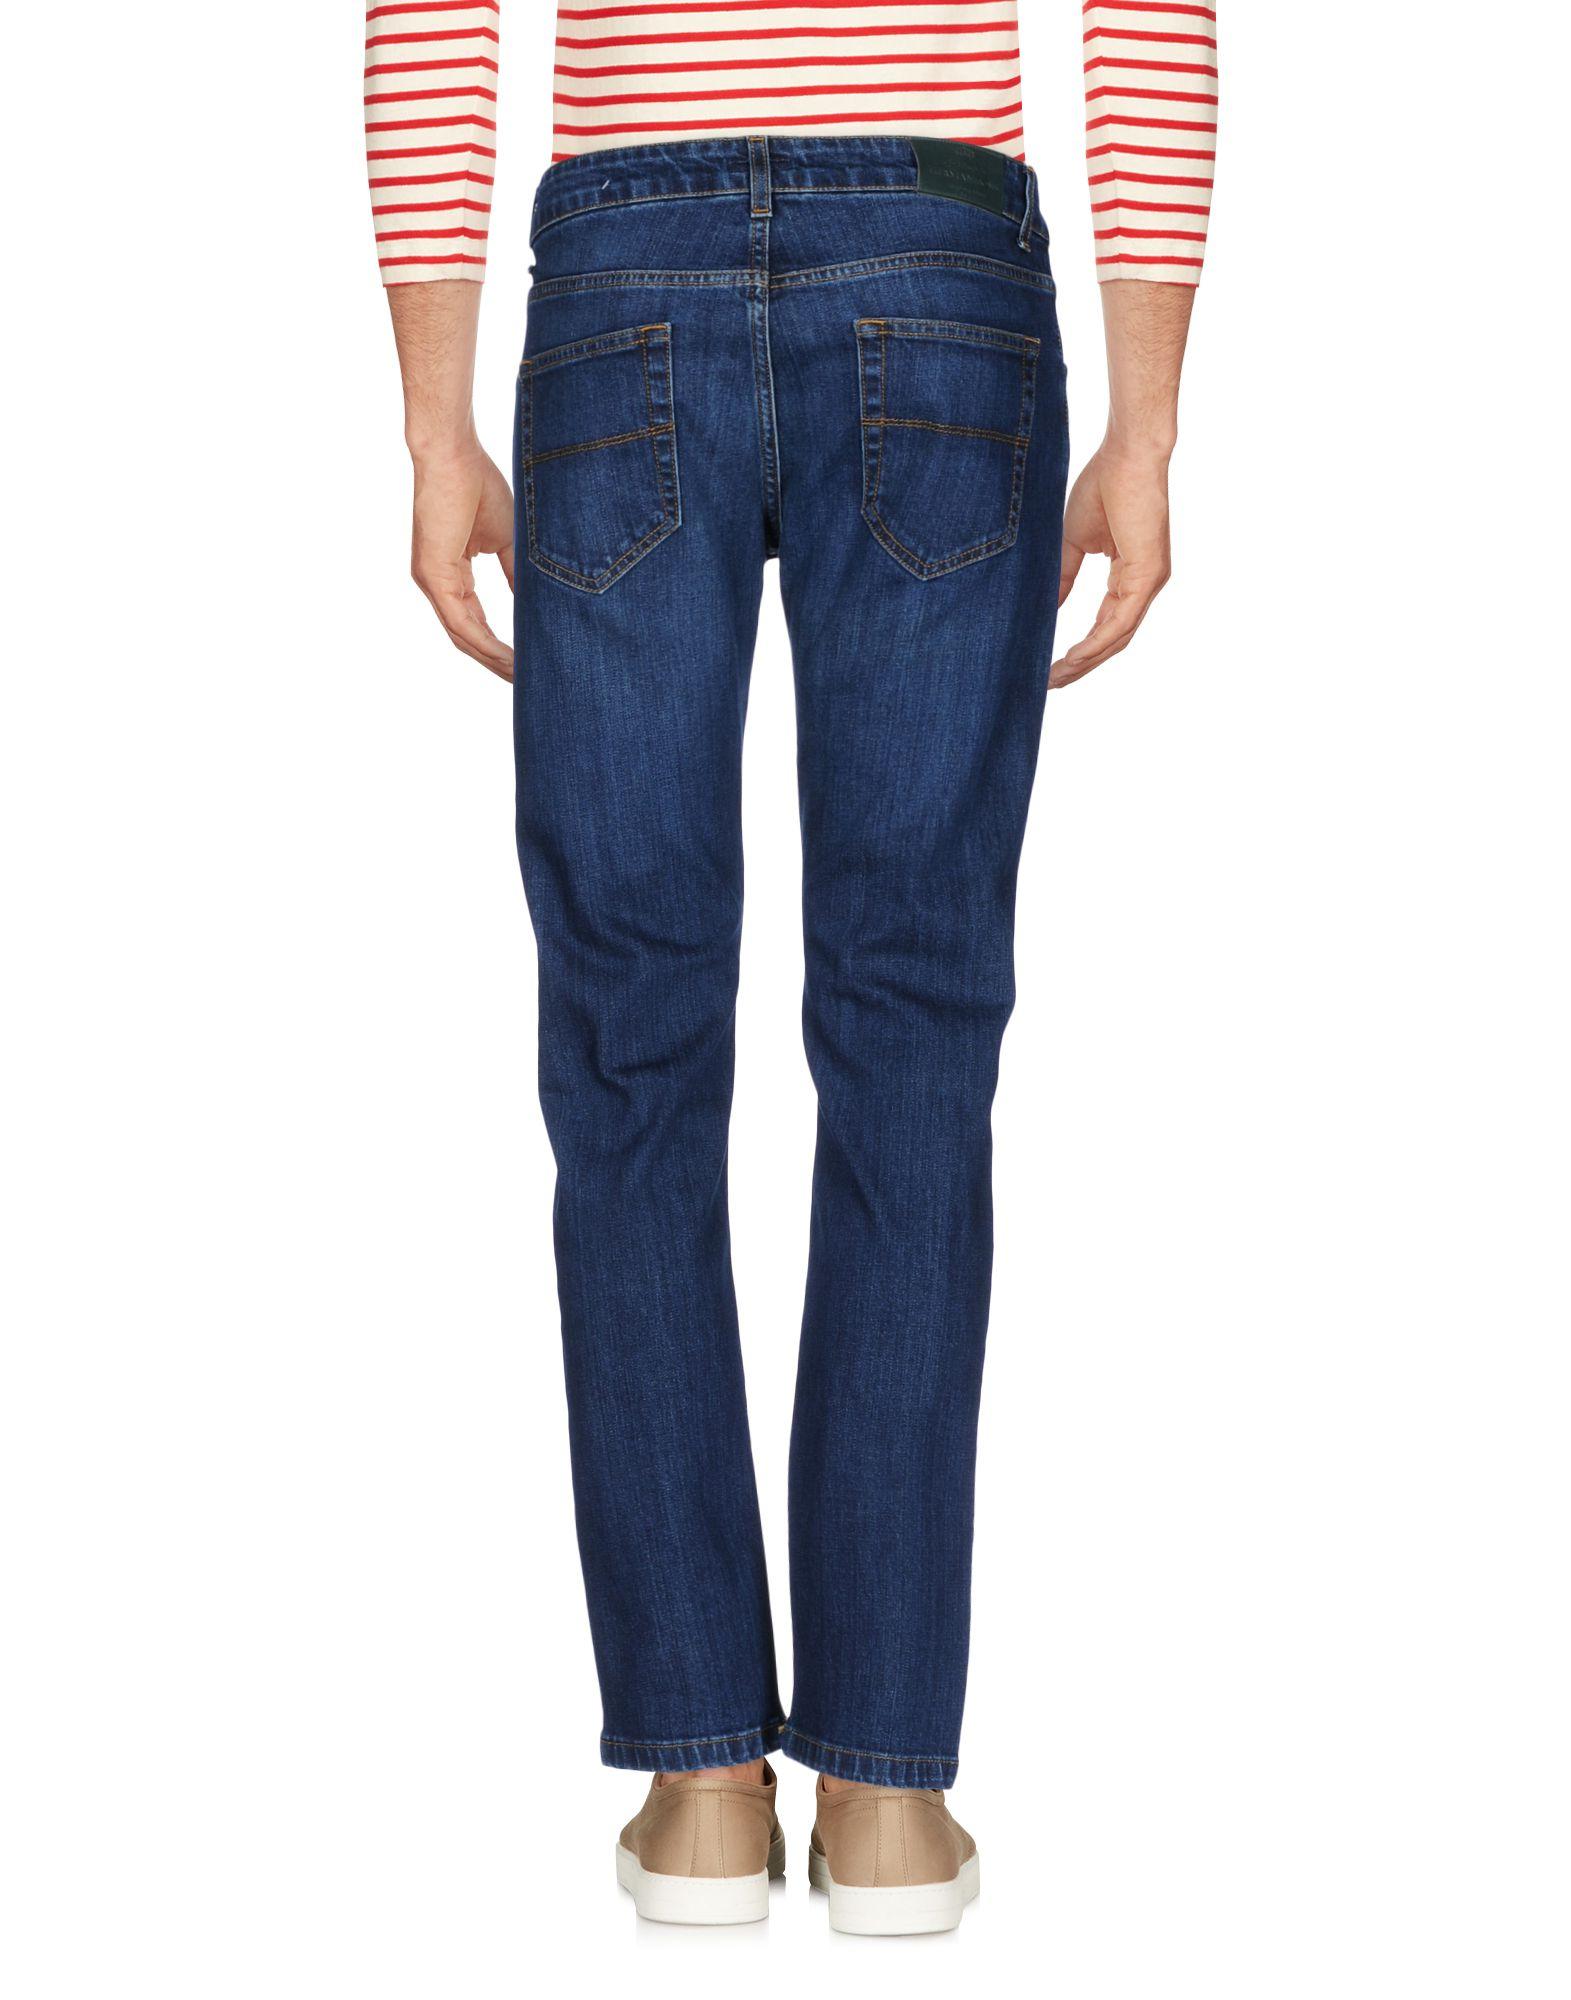 Pantaloni Jeans 42631001BS Herman & Sons Uomo - 42631001BS Jeans 989ab1